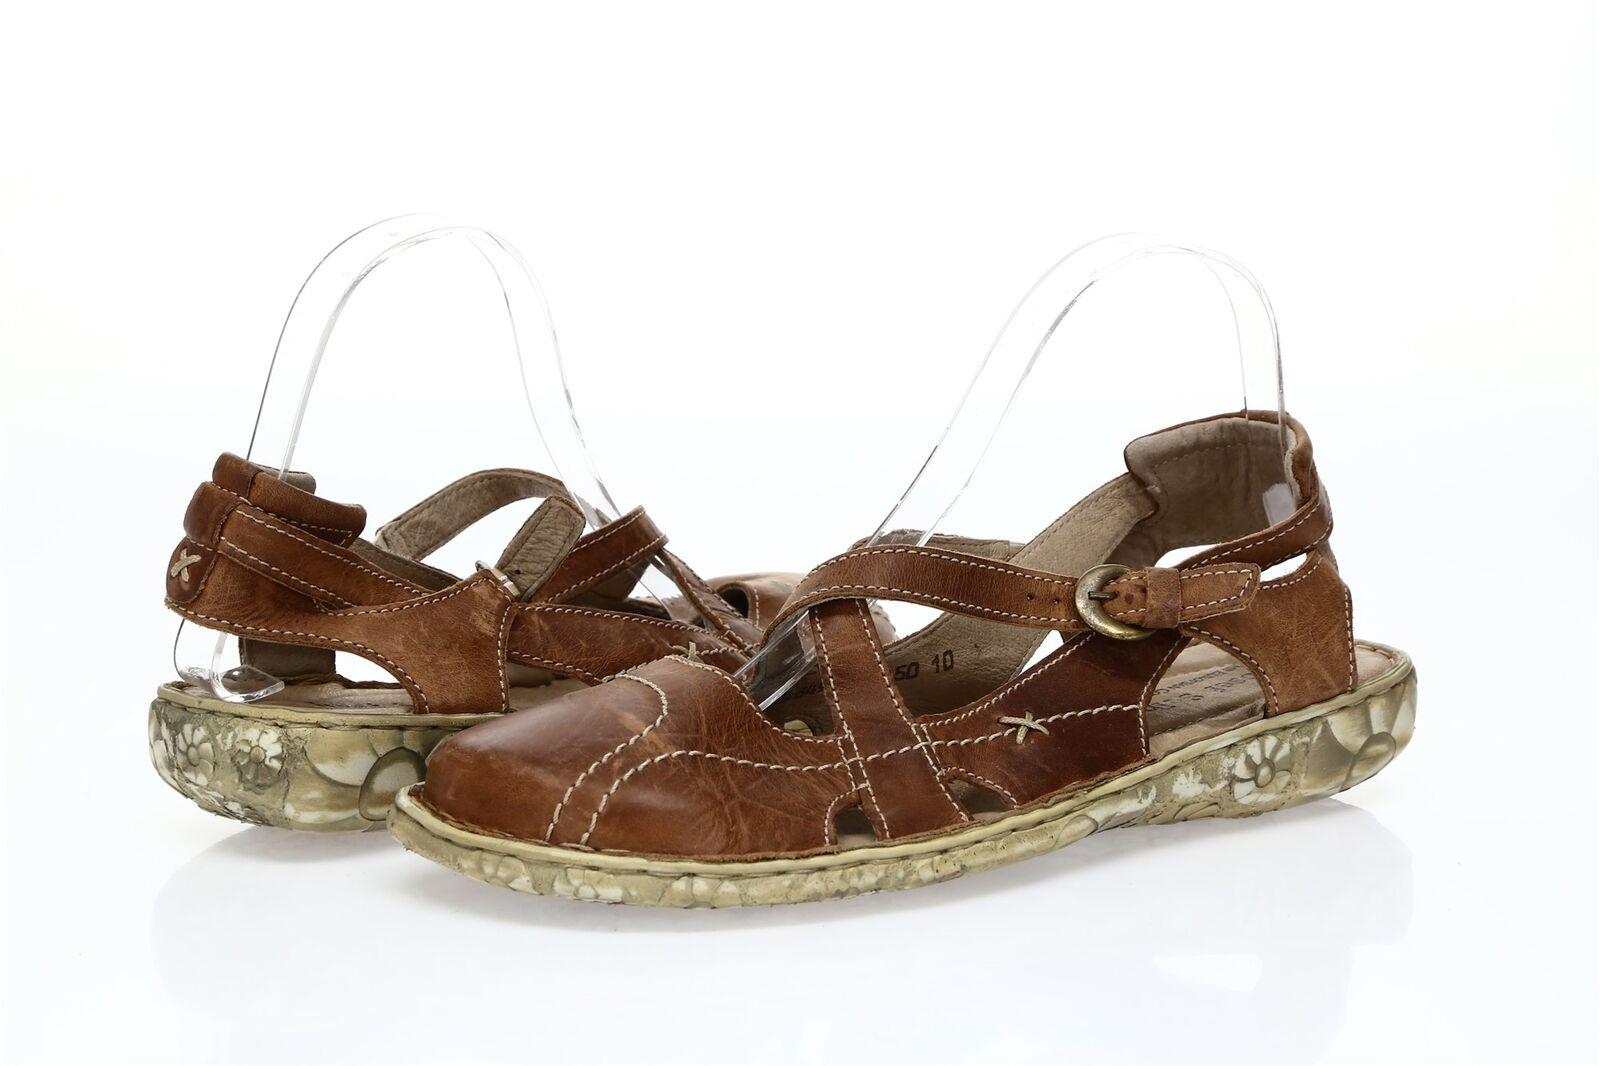 femmes JOSEF SEIBEL marron Leather Sandals Sz. 42 EU